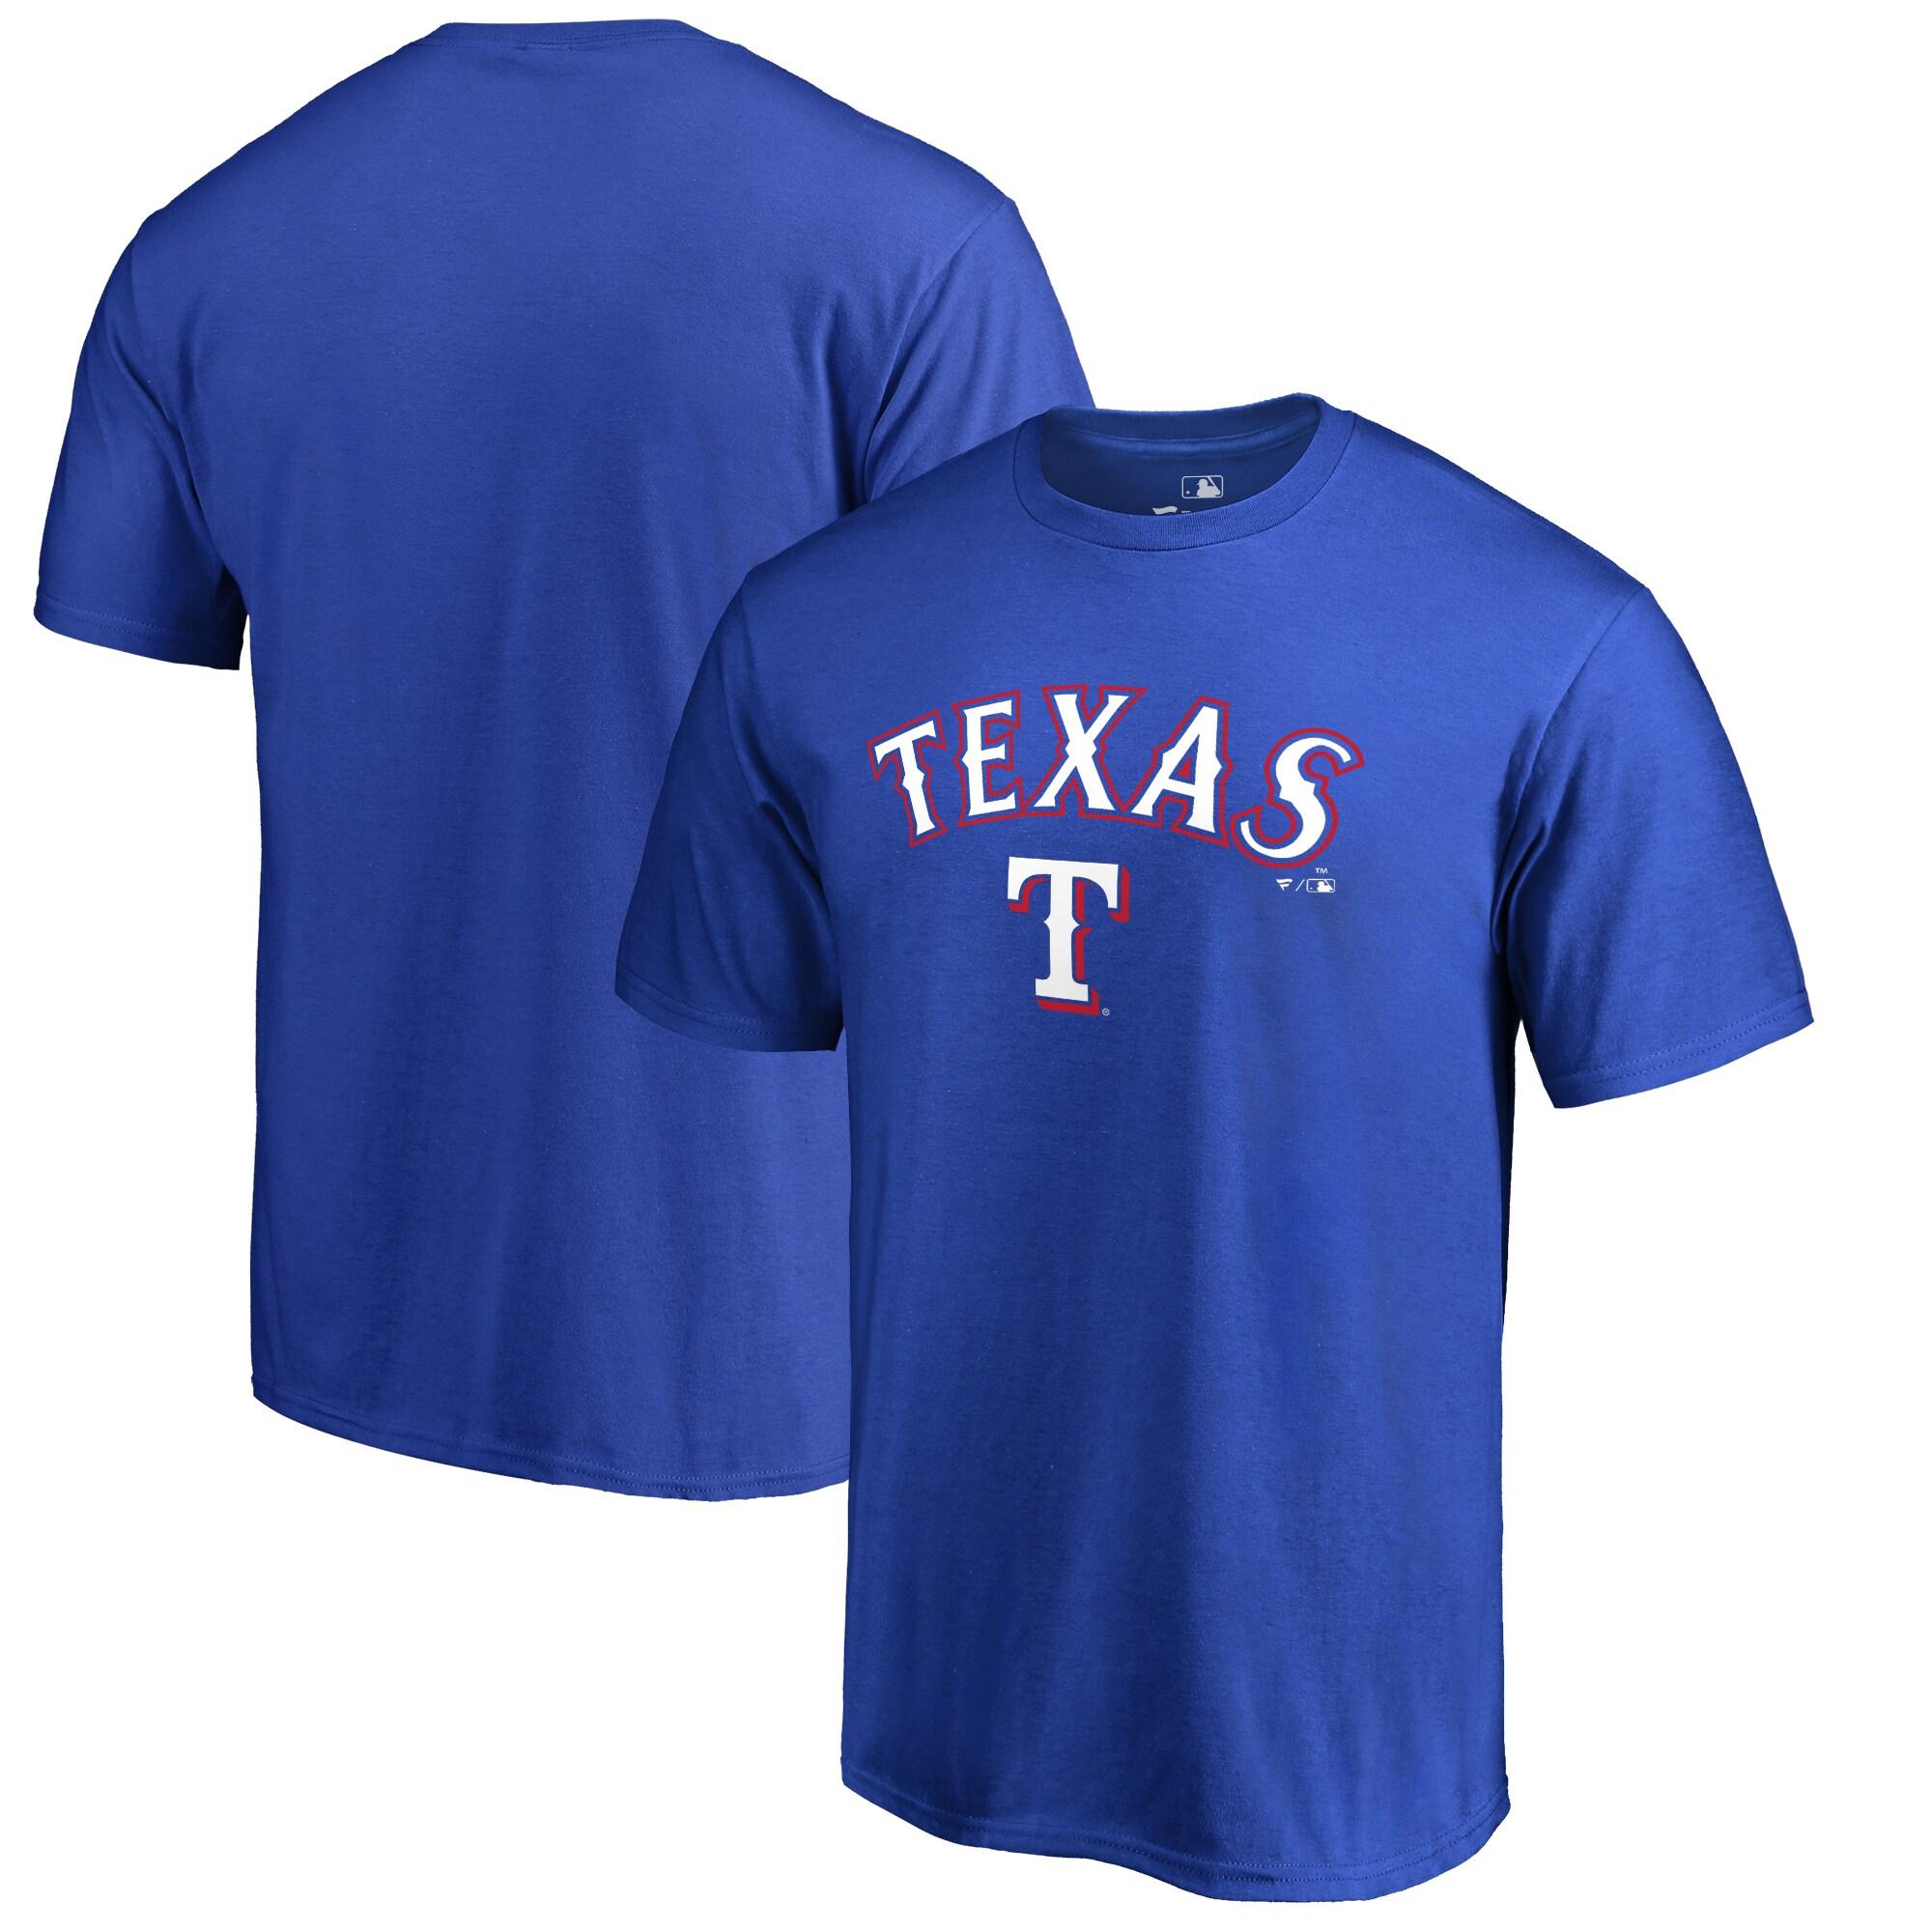 Texas Rangers Fanatics Branded Team Lockup T-Shirt - Royal